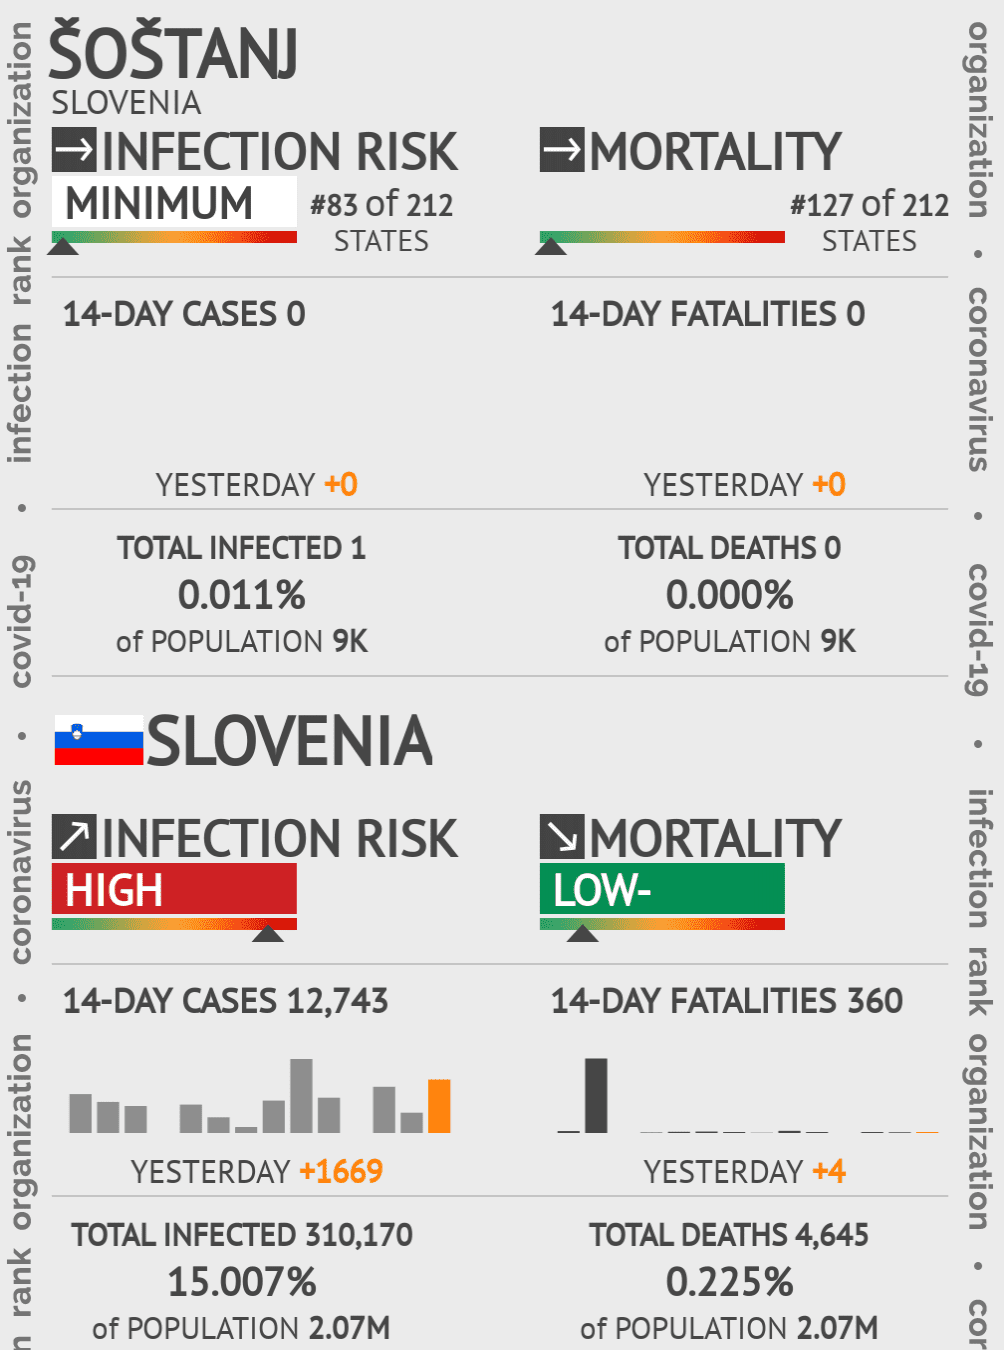 Šoštanj Coronavirus Covid-19 Risk of Infection on May 14, 2020